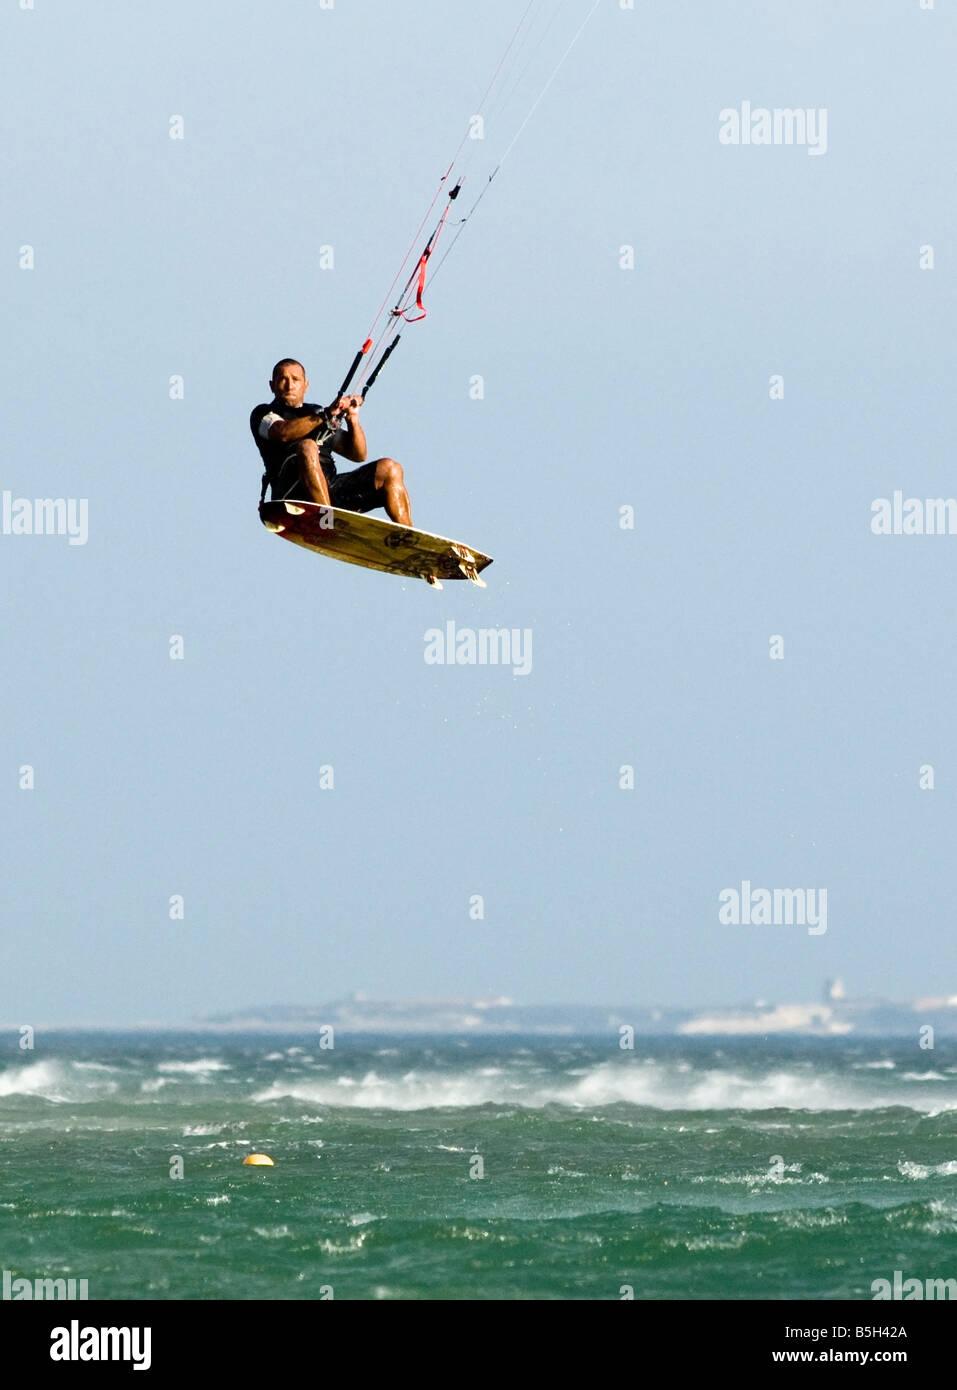 high jump by a kitesurfer - Stock Image